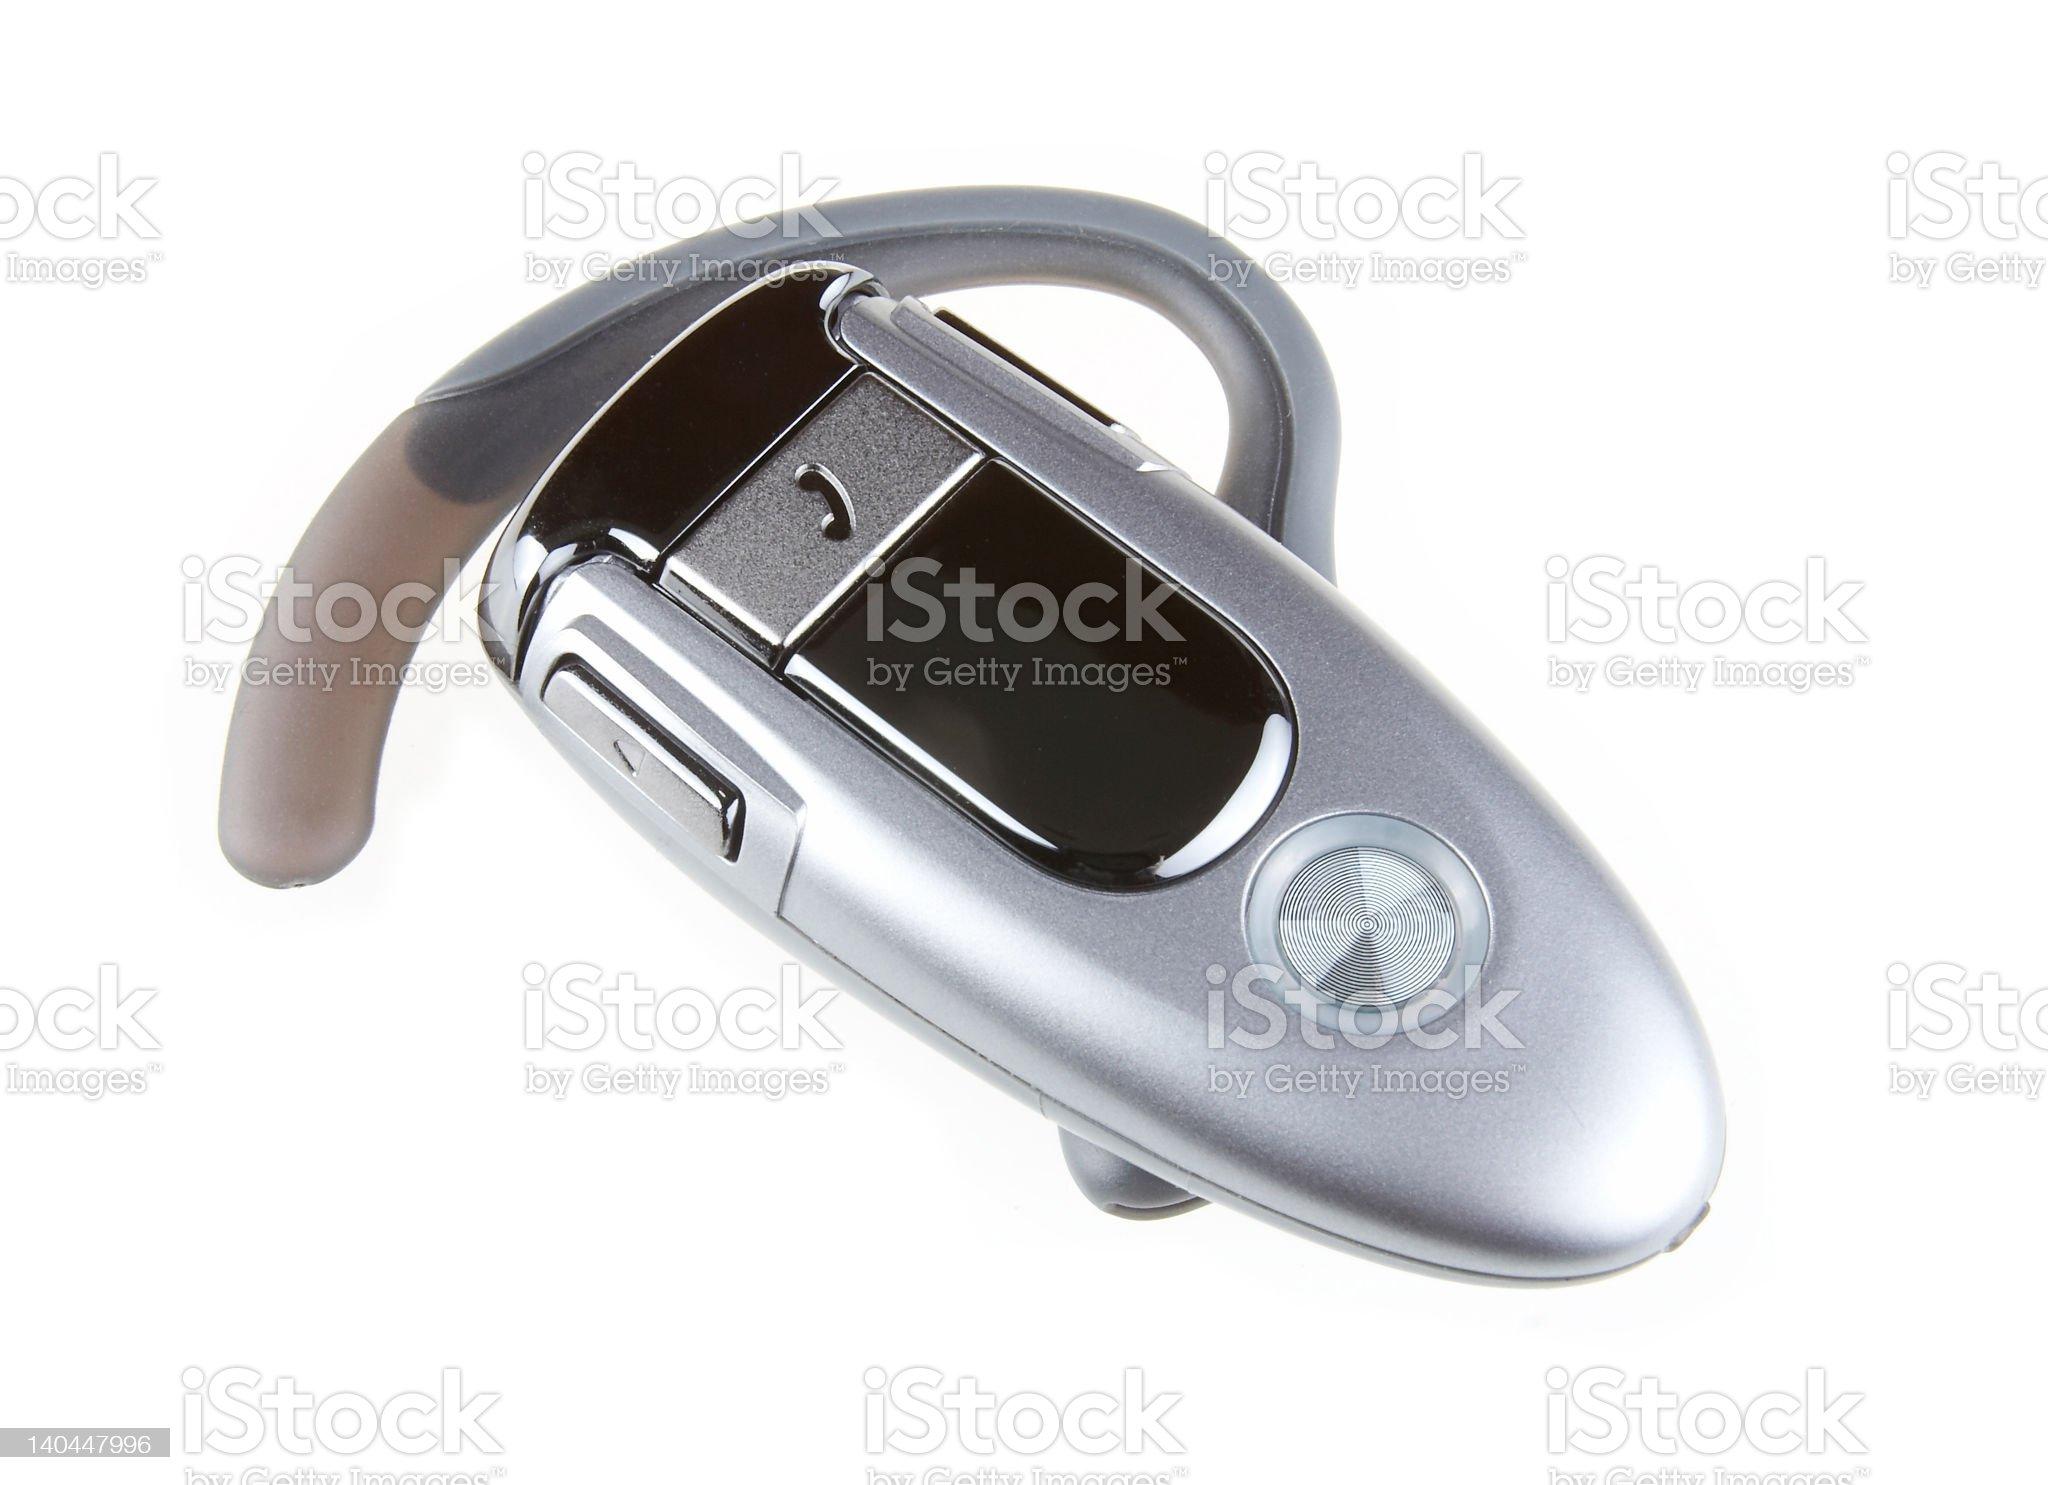 Bluetooth headset royalty-free stock photo